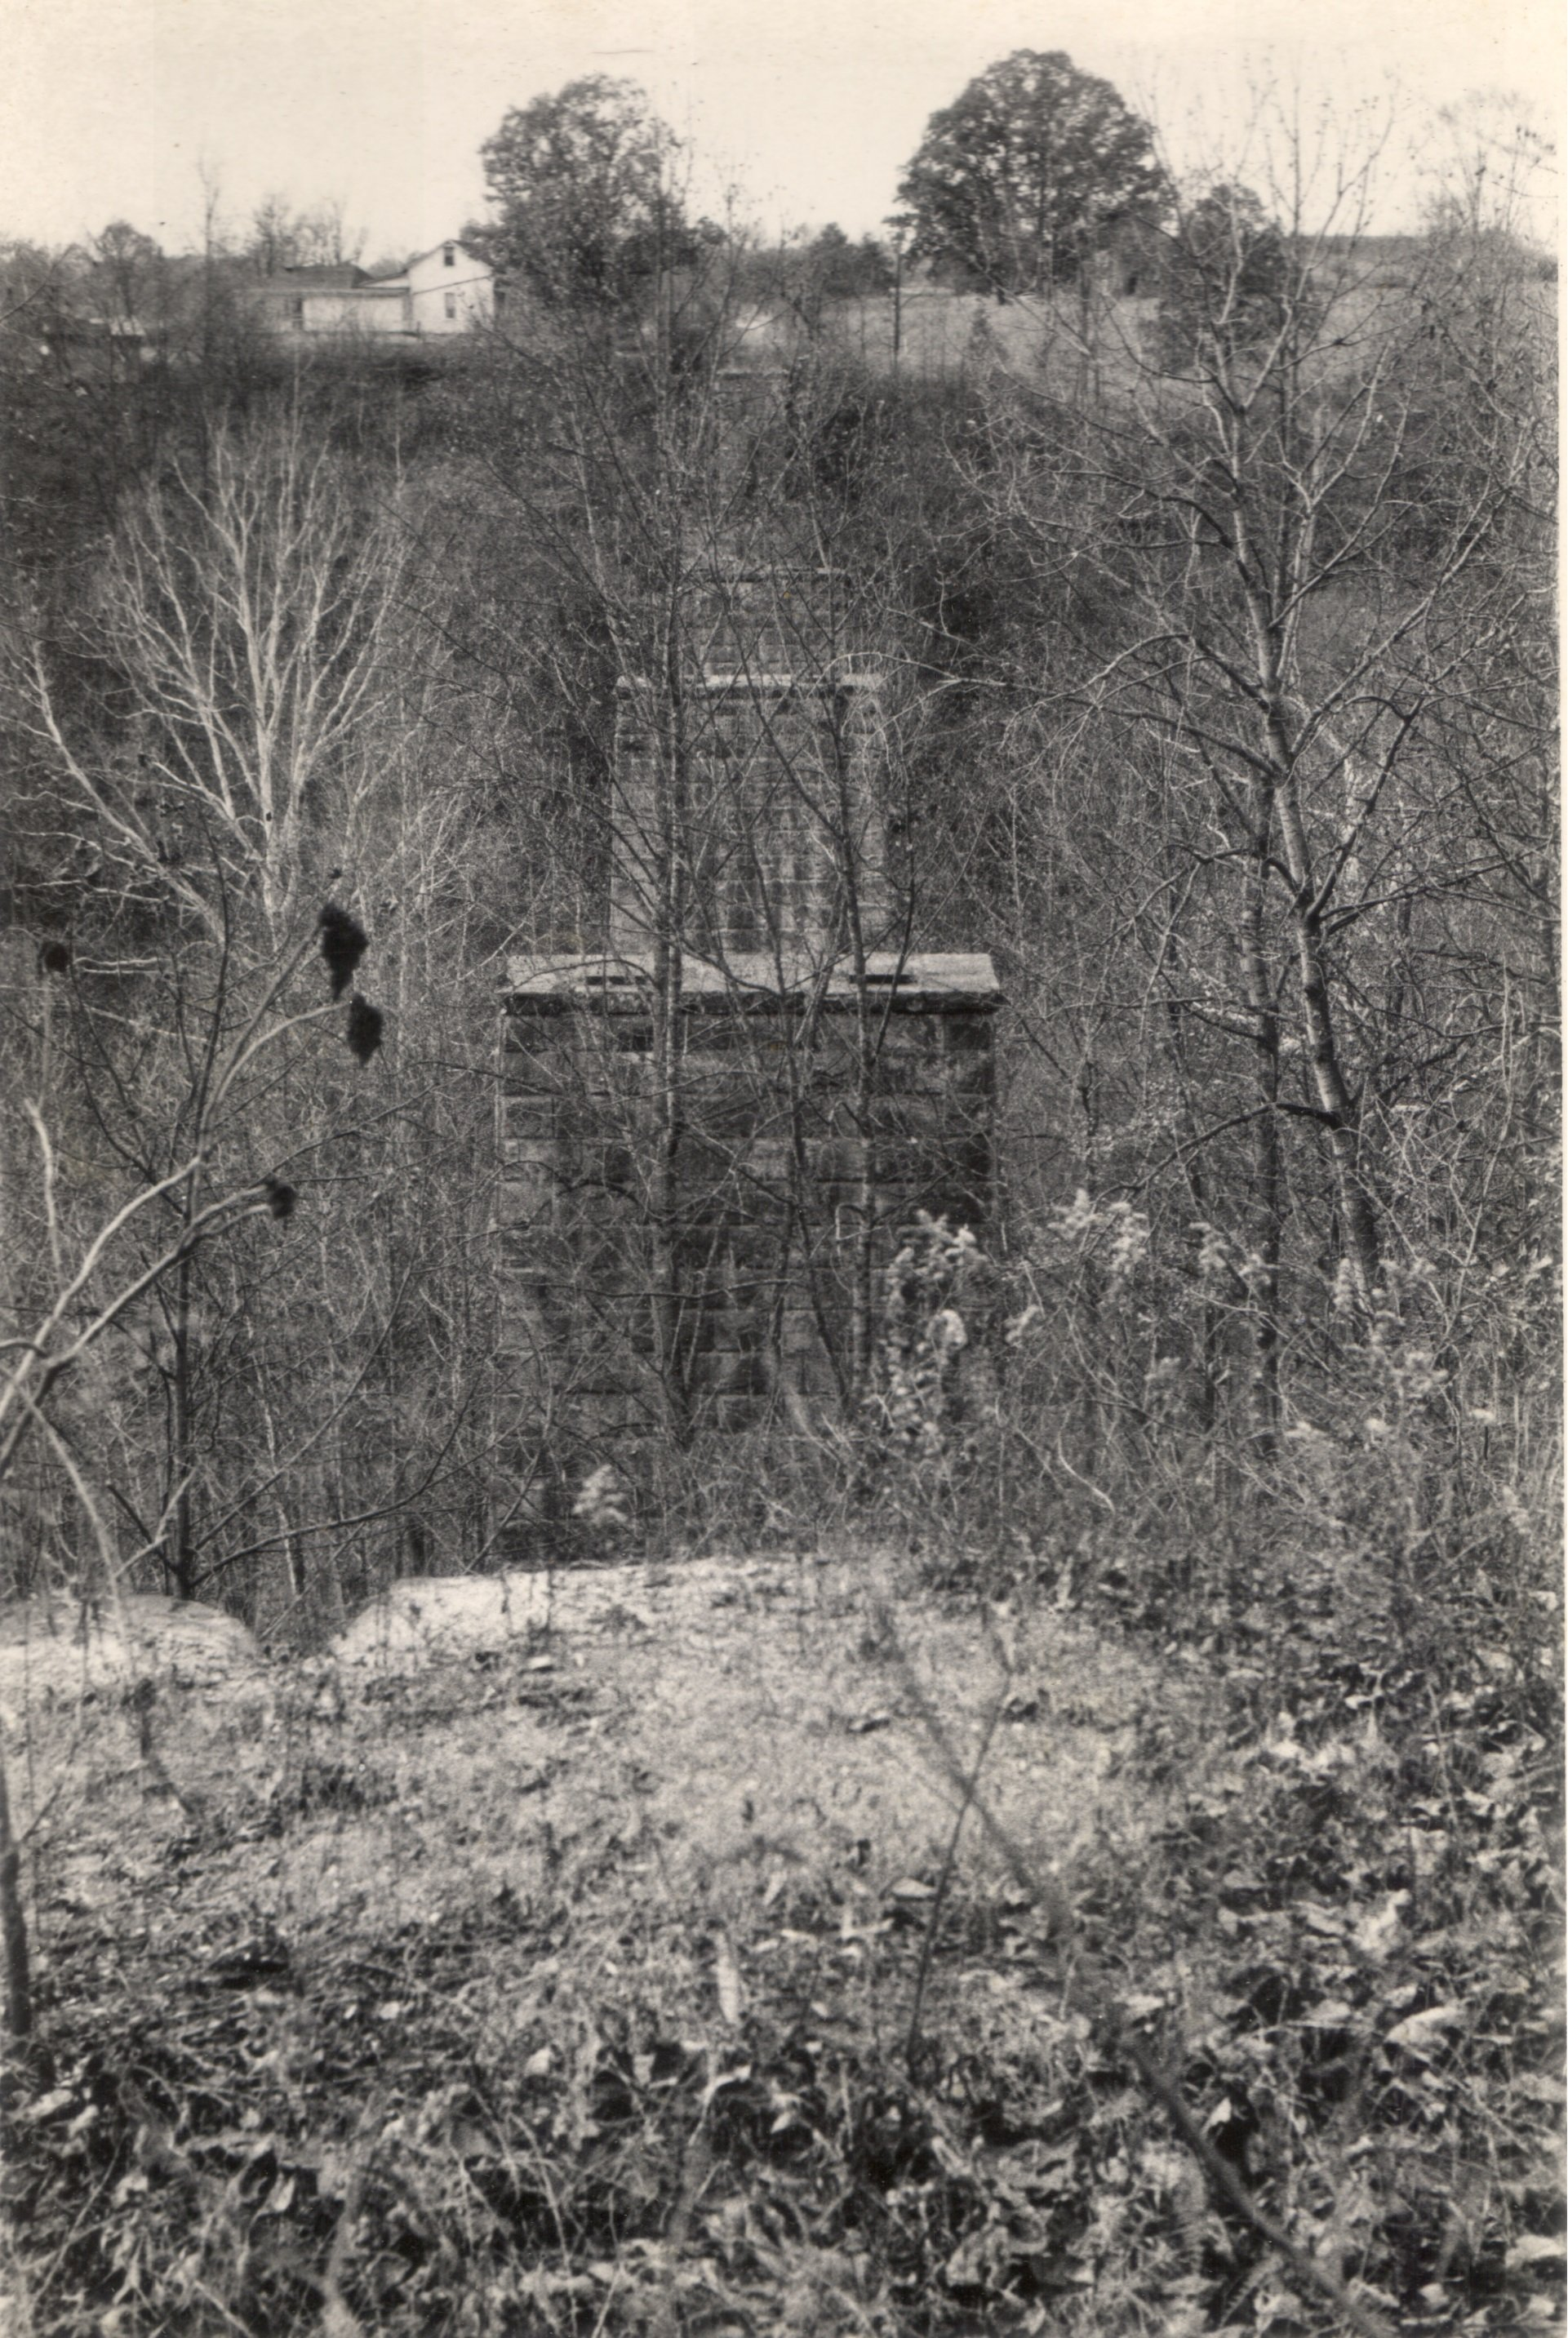 Dunbar Piers circa 1950. Courtesy of the Southeast Ohio History Center